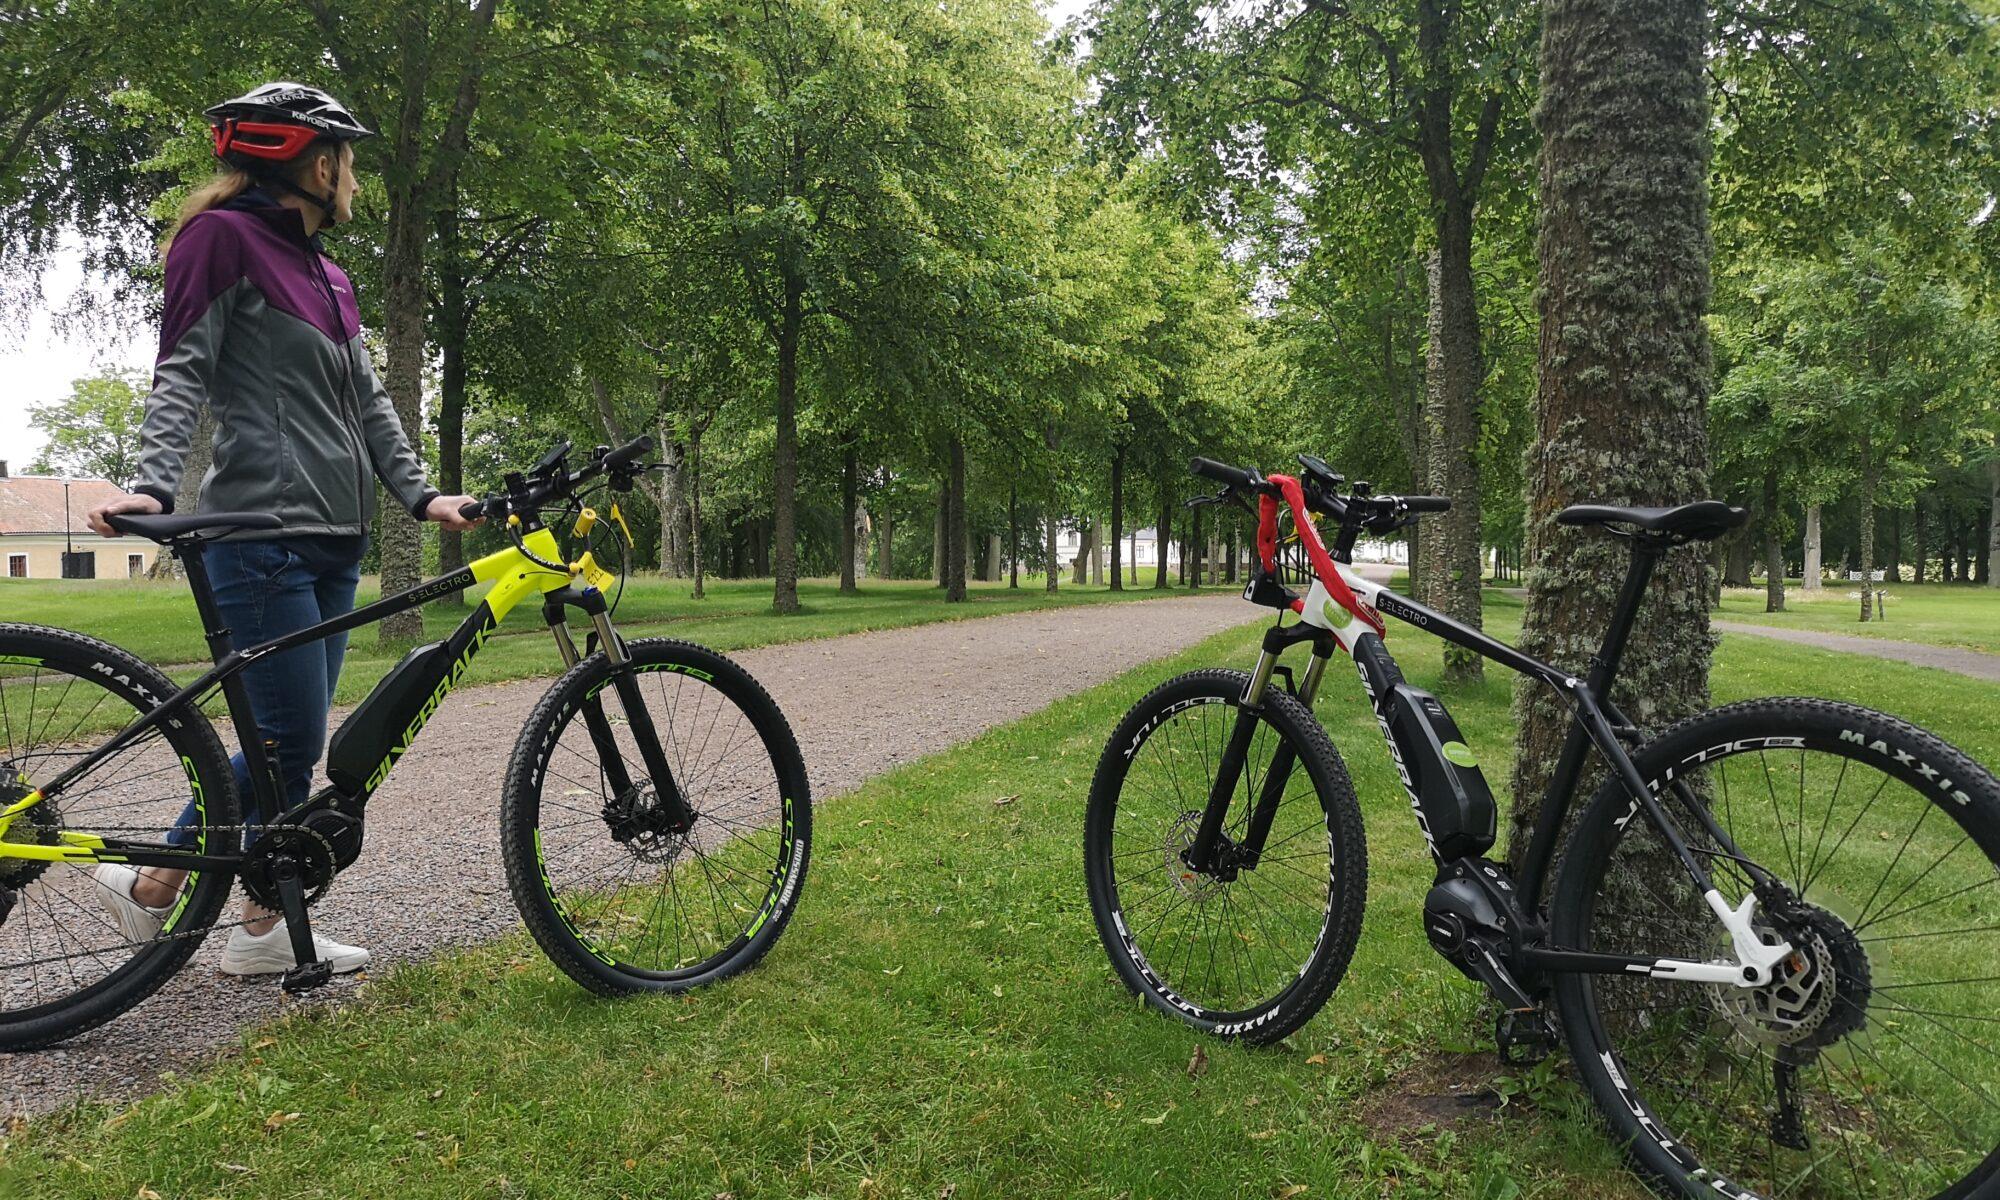 Rent e-mountainbike in Askersund and Örebro